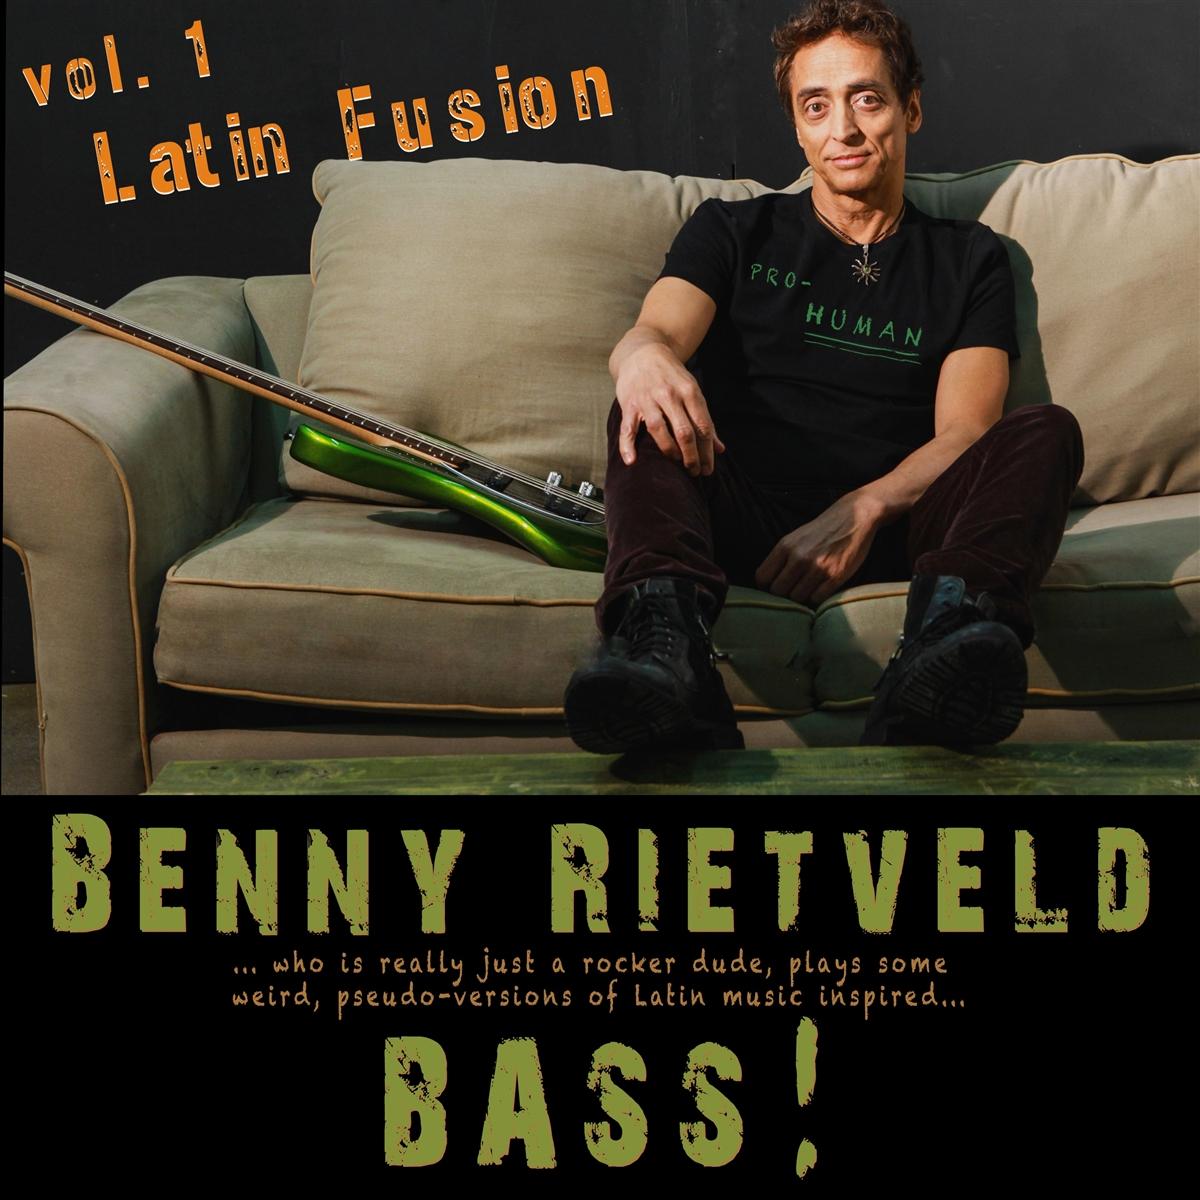 BENNY RIETVELD BASS: LATIN FUSION, VOLUME 1